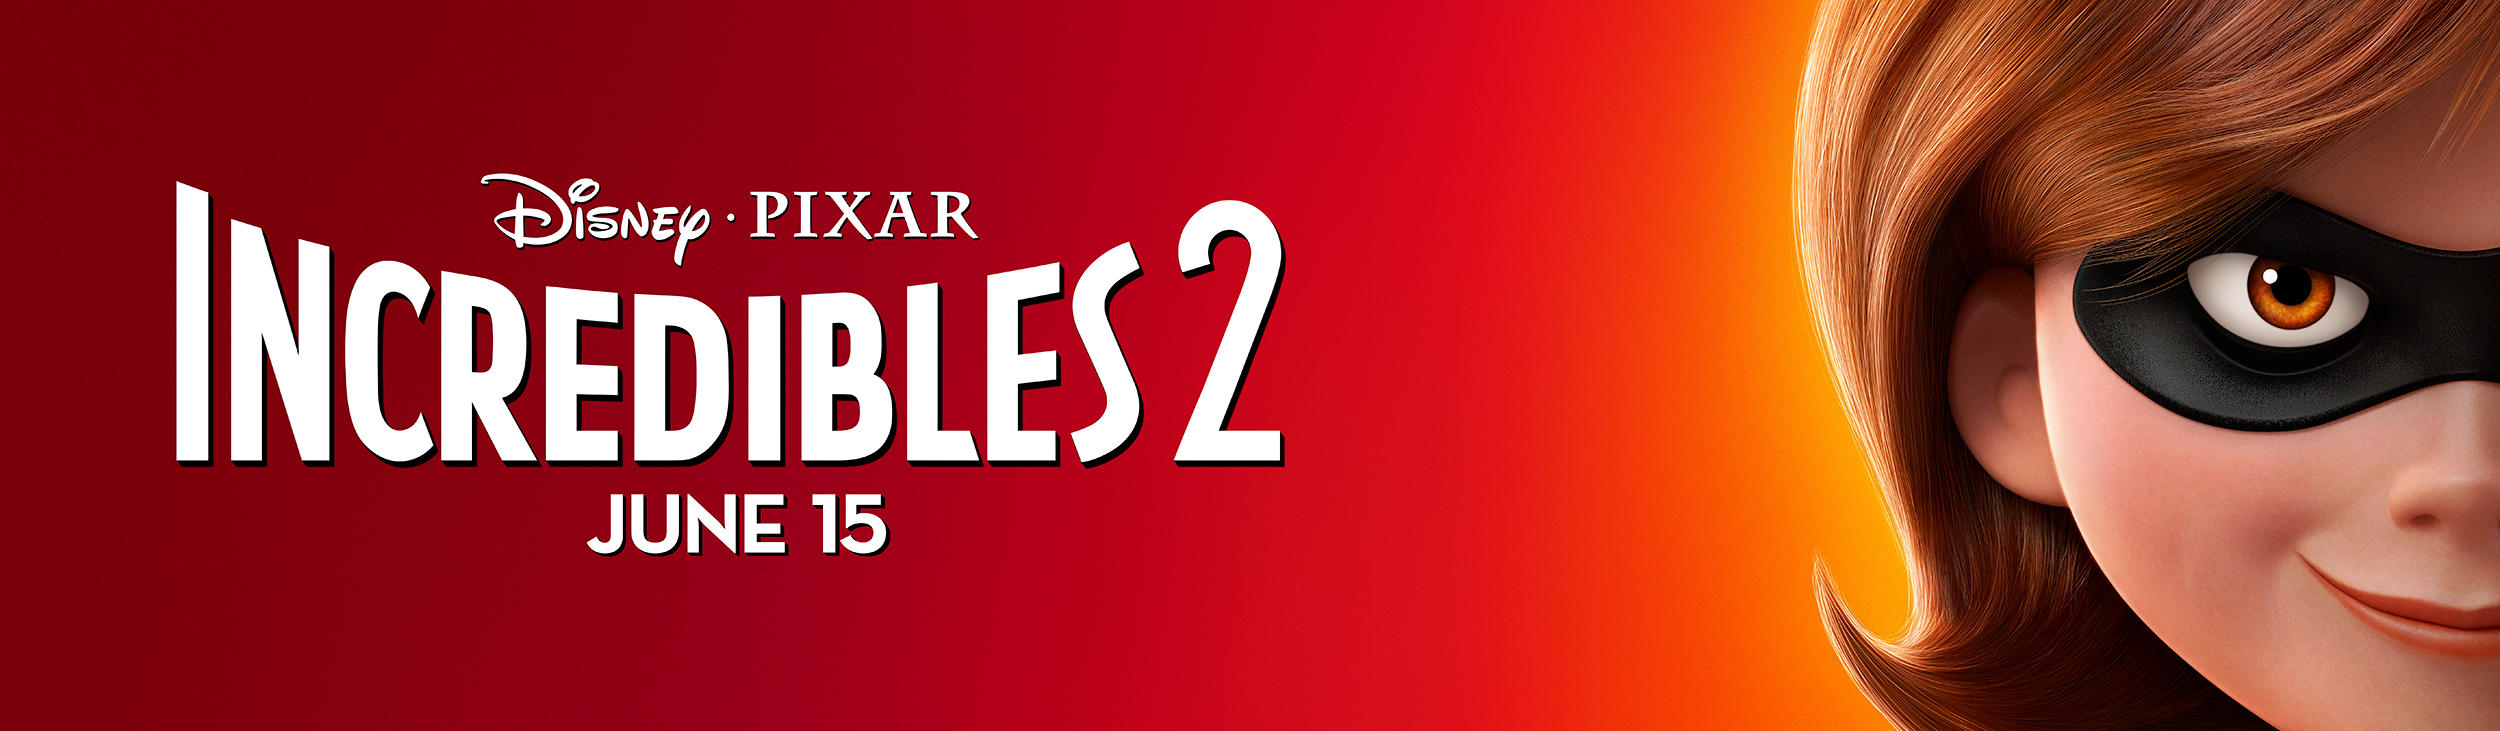 Incredibles 2 | Helen Billboard Concept, Finishing & Illustration